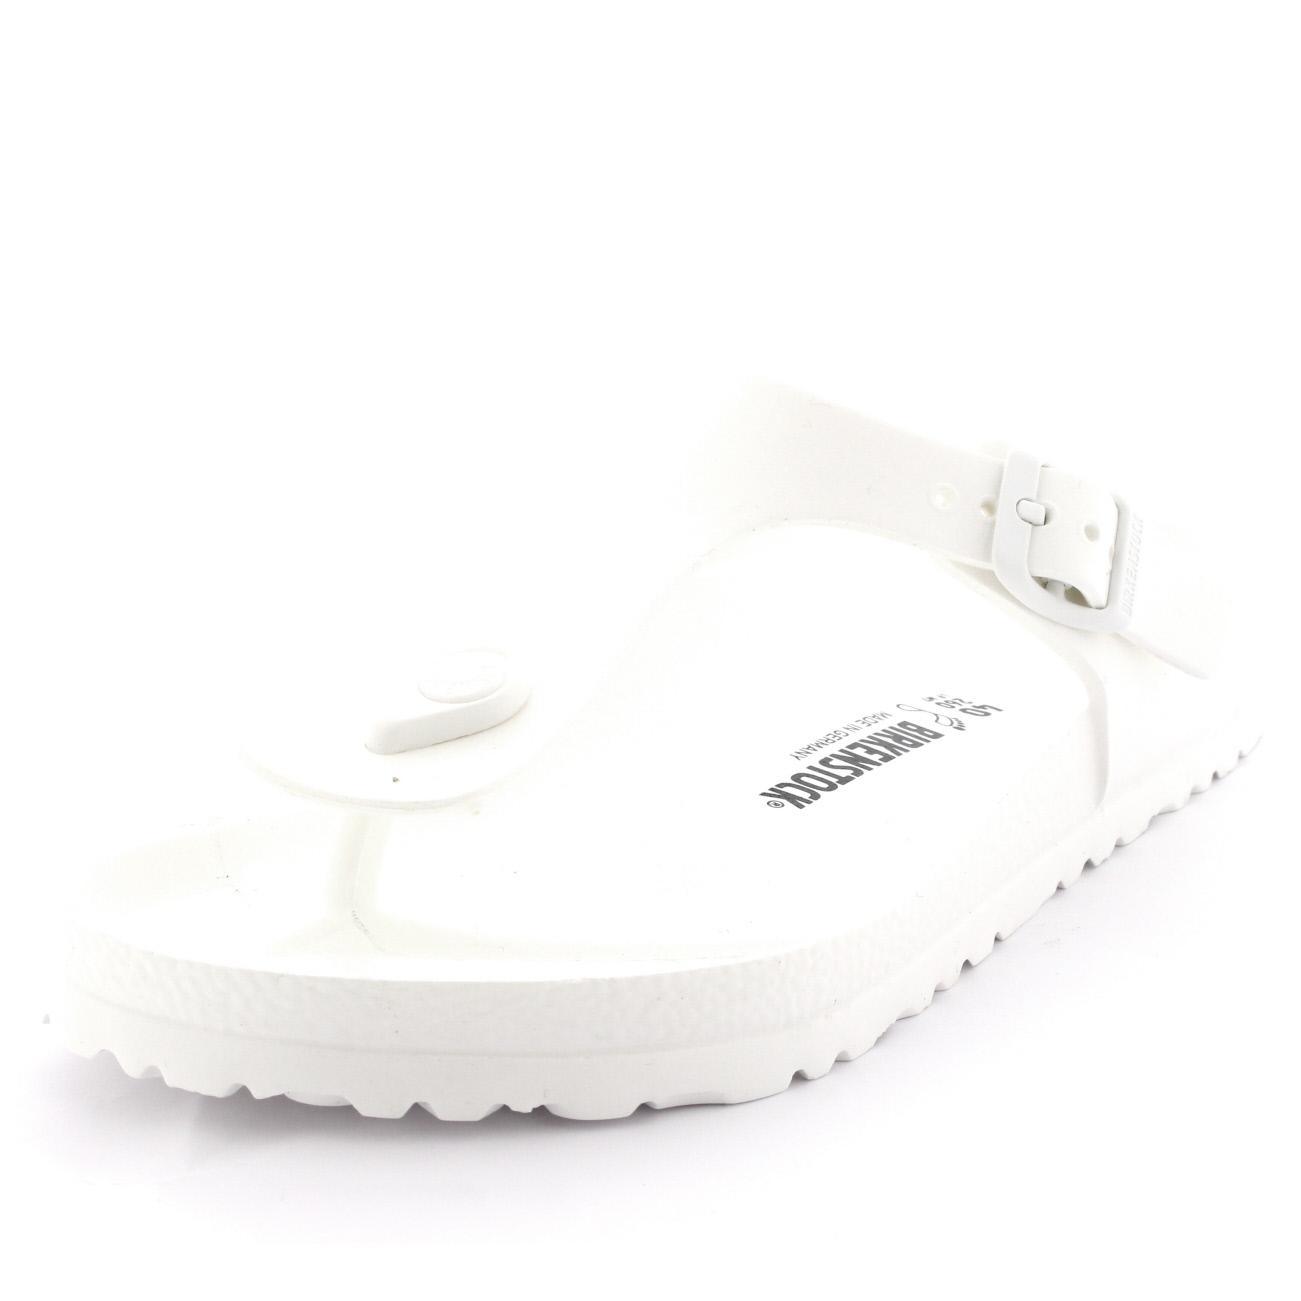 Unisex-Adults-Birkenstock-Gizeh-Summer-EVA-Toe-Post-Beach-Flat-Sandals-All-Sizes thumbnail 18